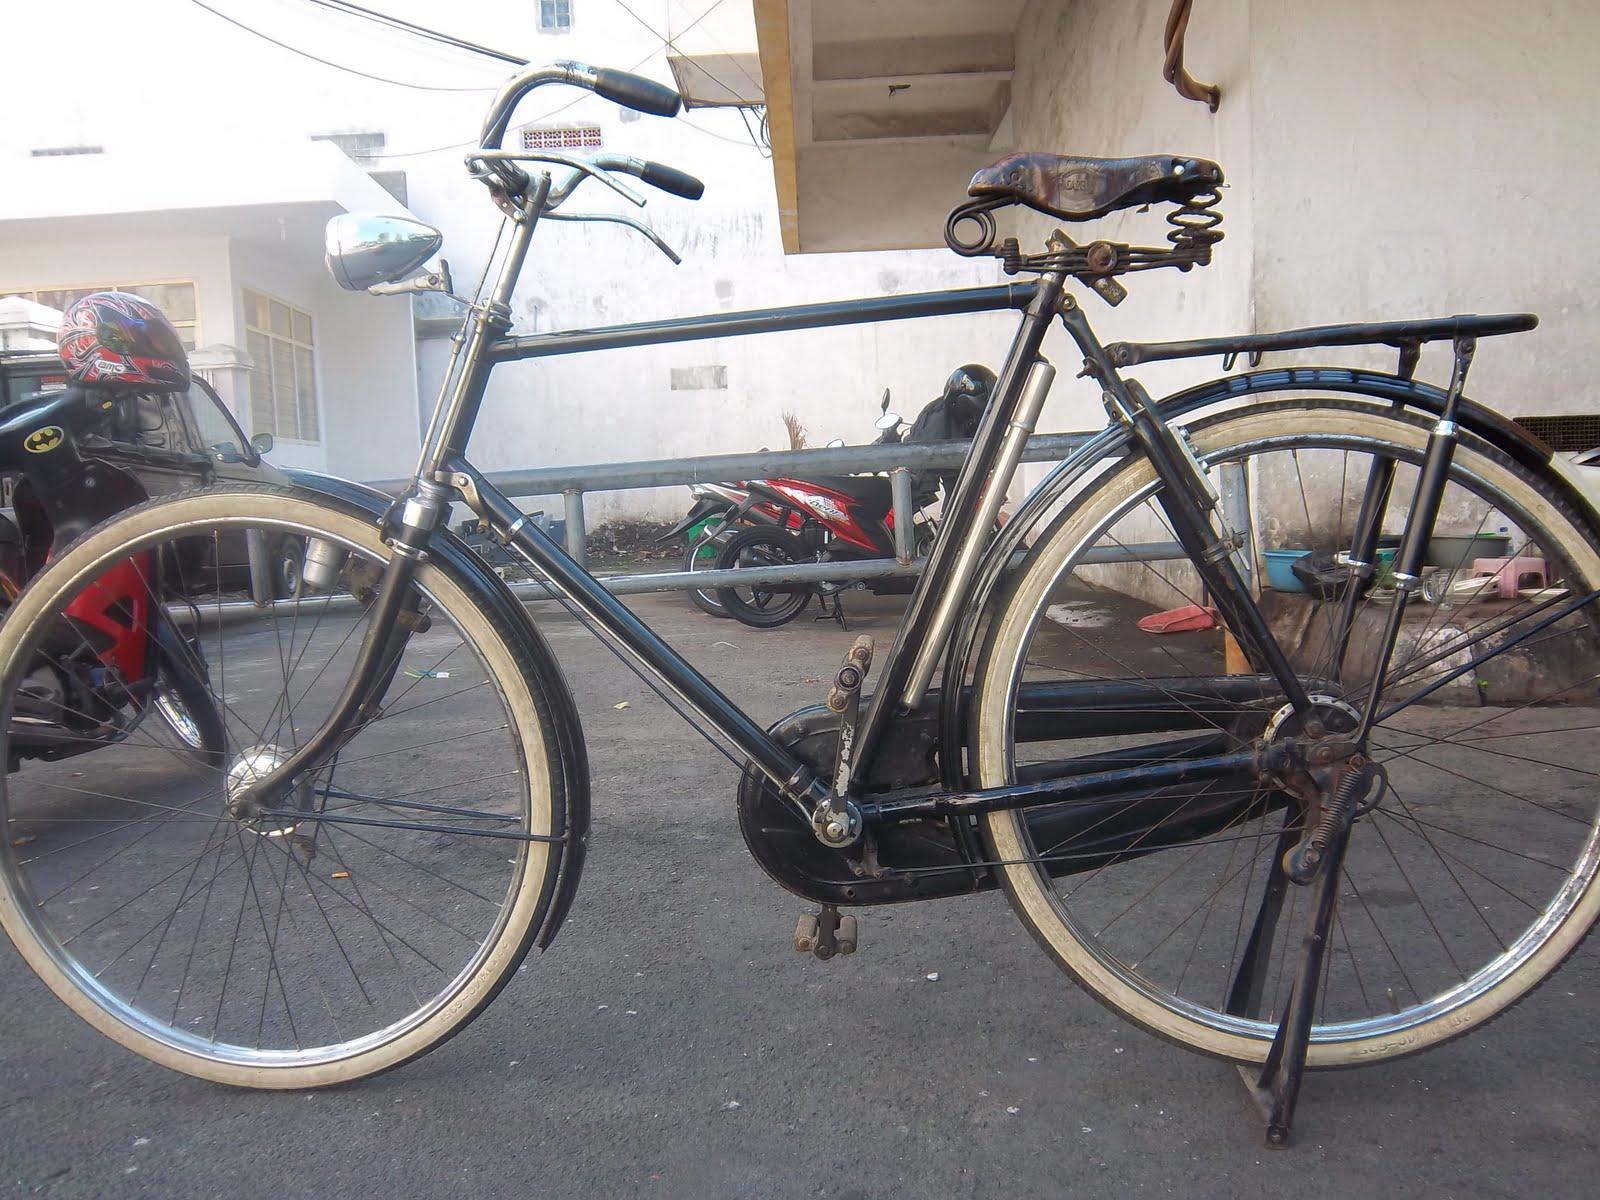 klithikan onthel sepeda quotgazellequot seri 5